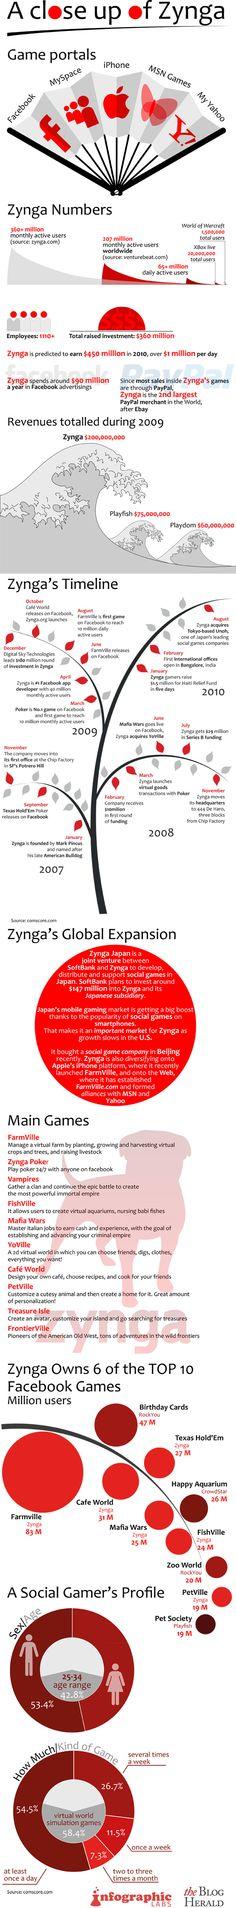 The Zynga Statistics: Games, Platforms, Timeline and Revenue Analysis